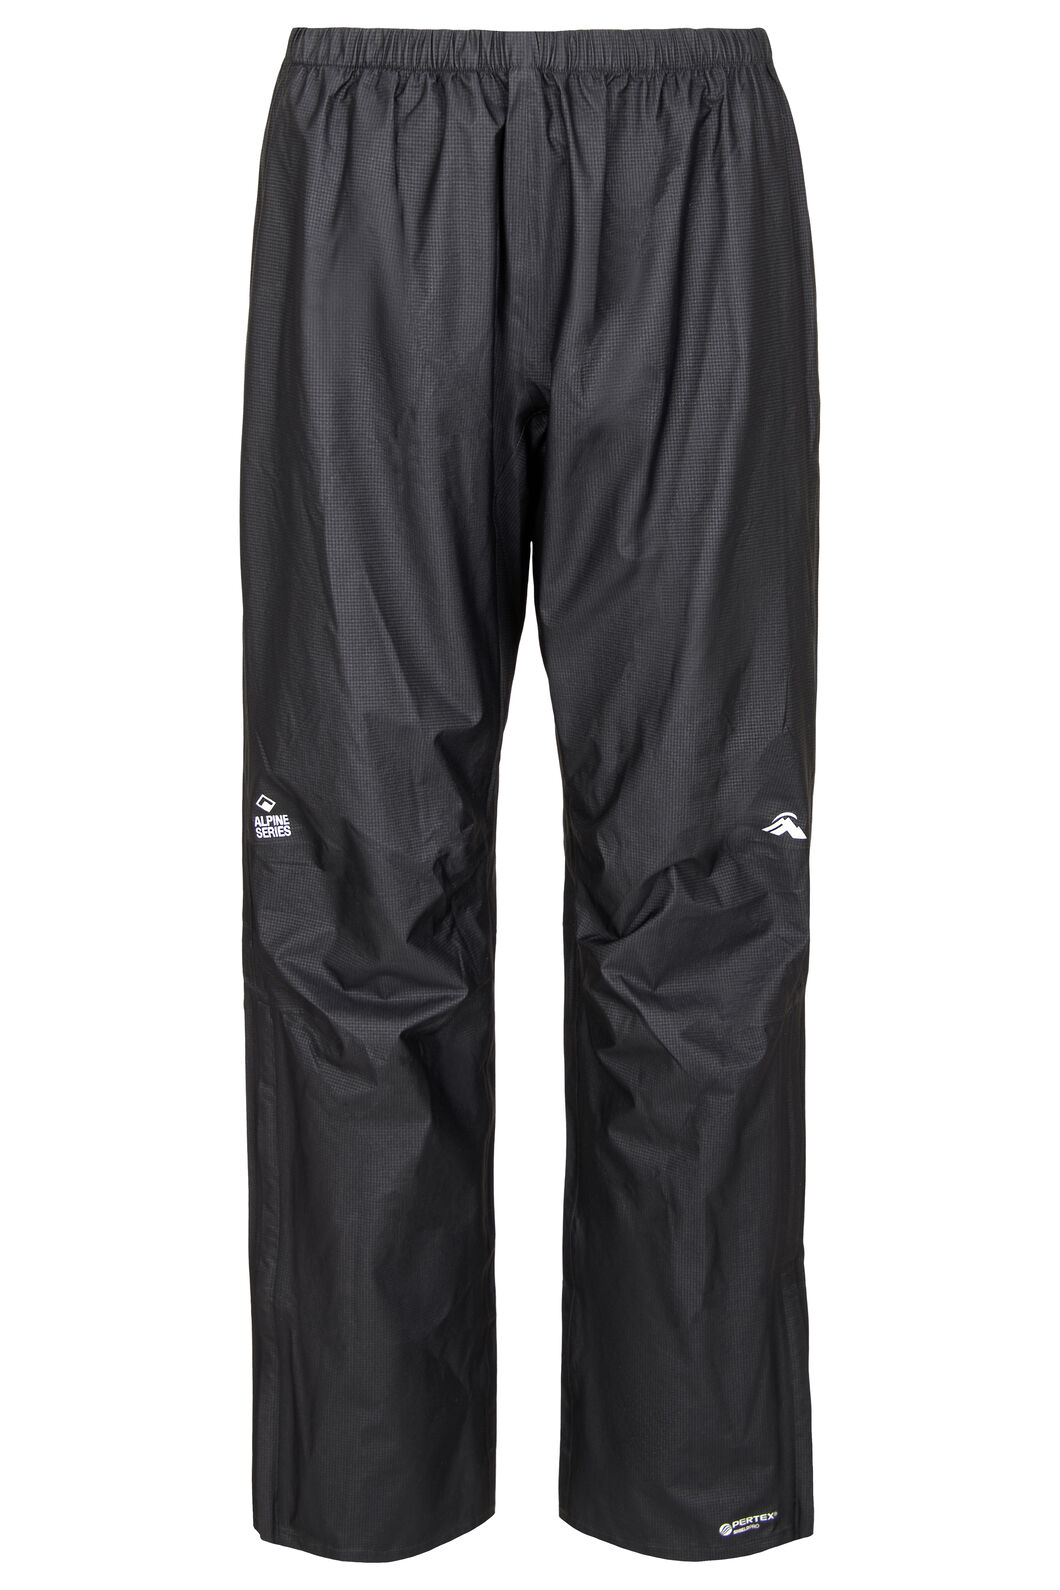 Macpac Men's Nazomi Pertex® Rain Pants, Black, hi-res